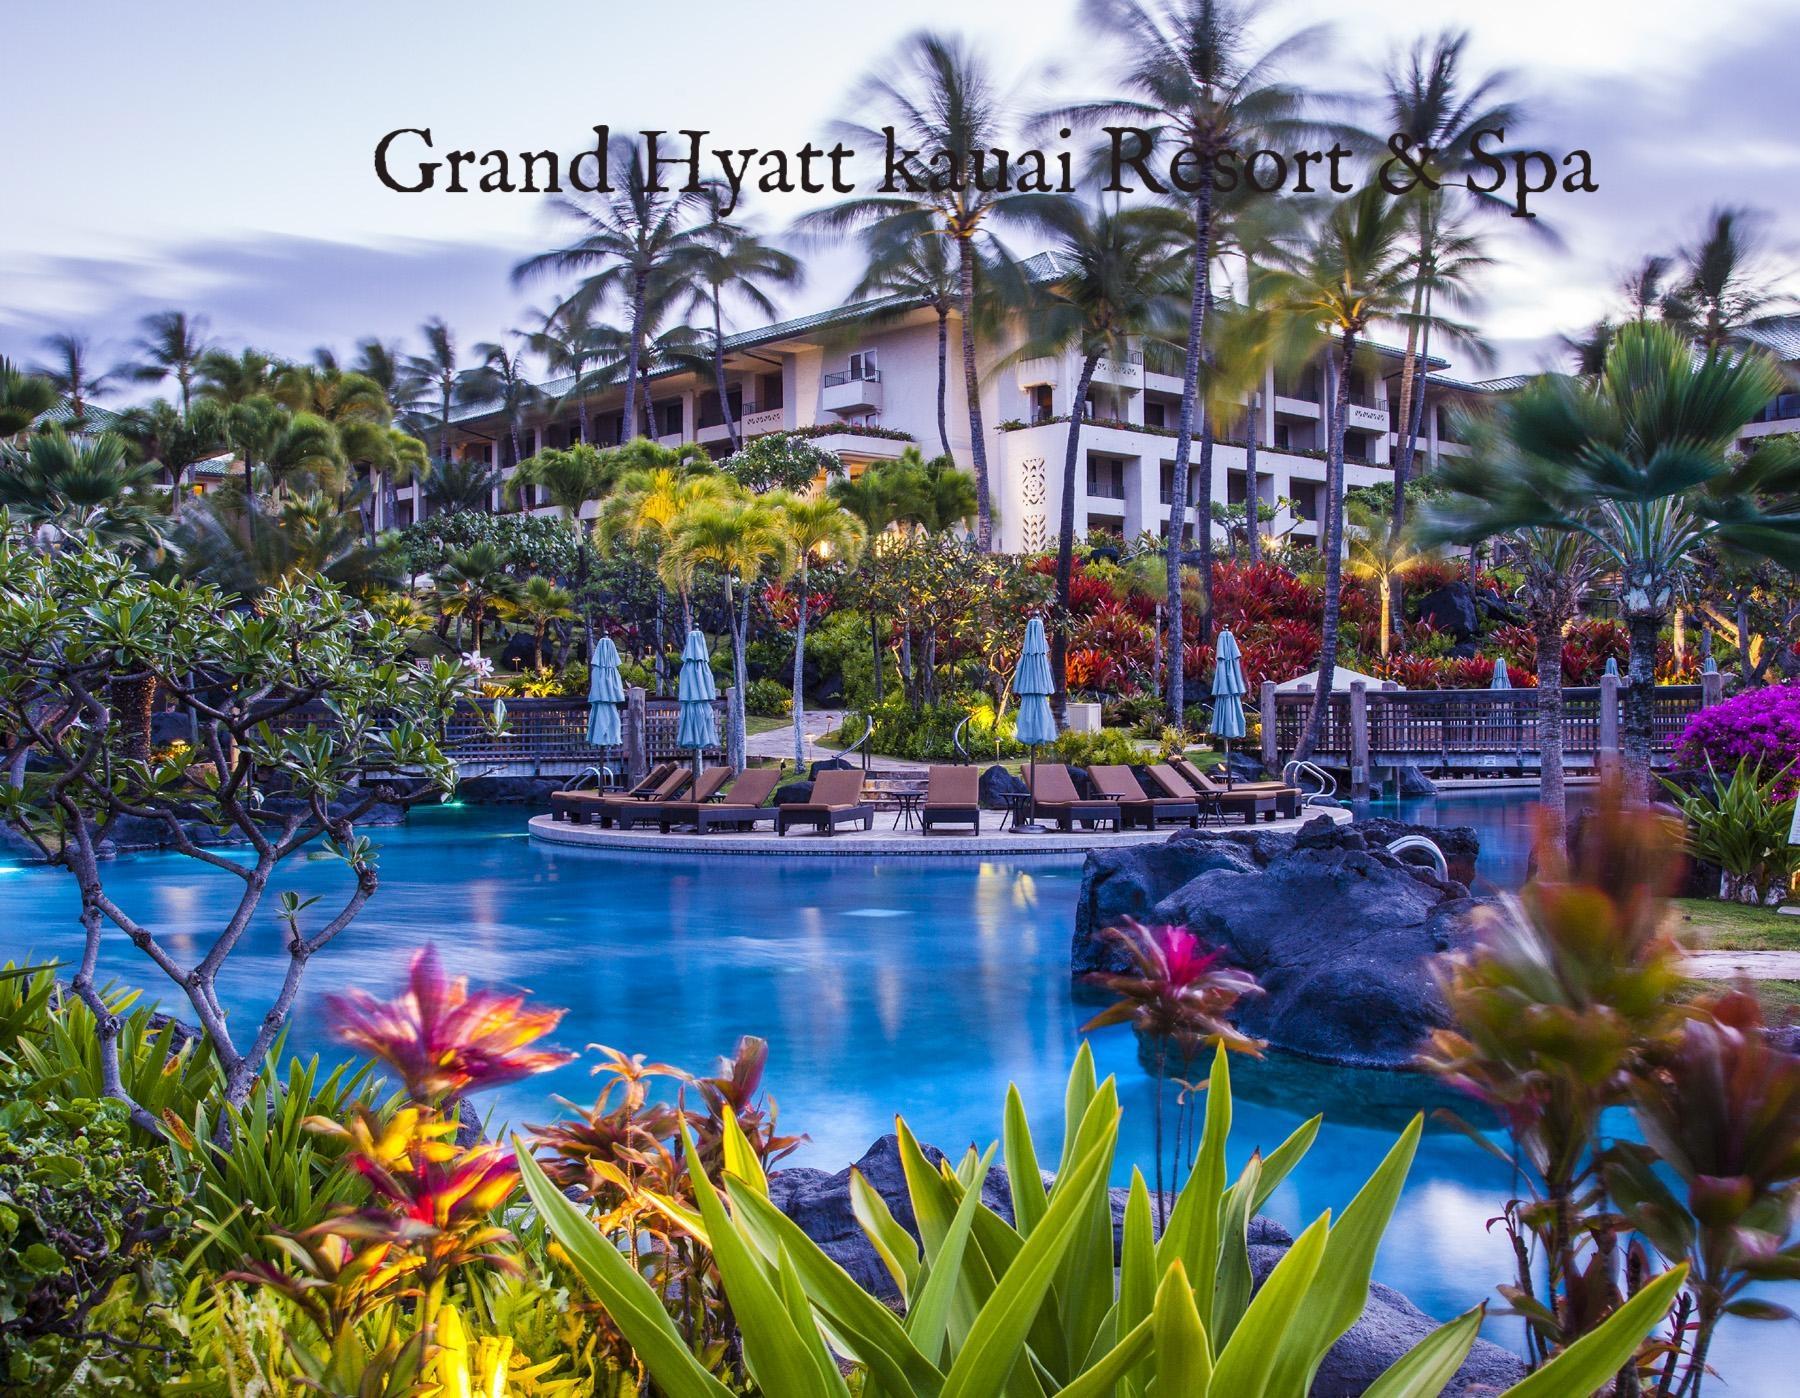 Grand-Hyatt-Kauai-Resort-and-Spa-Pool.jpg